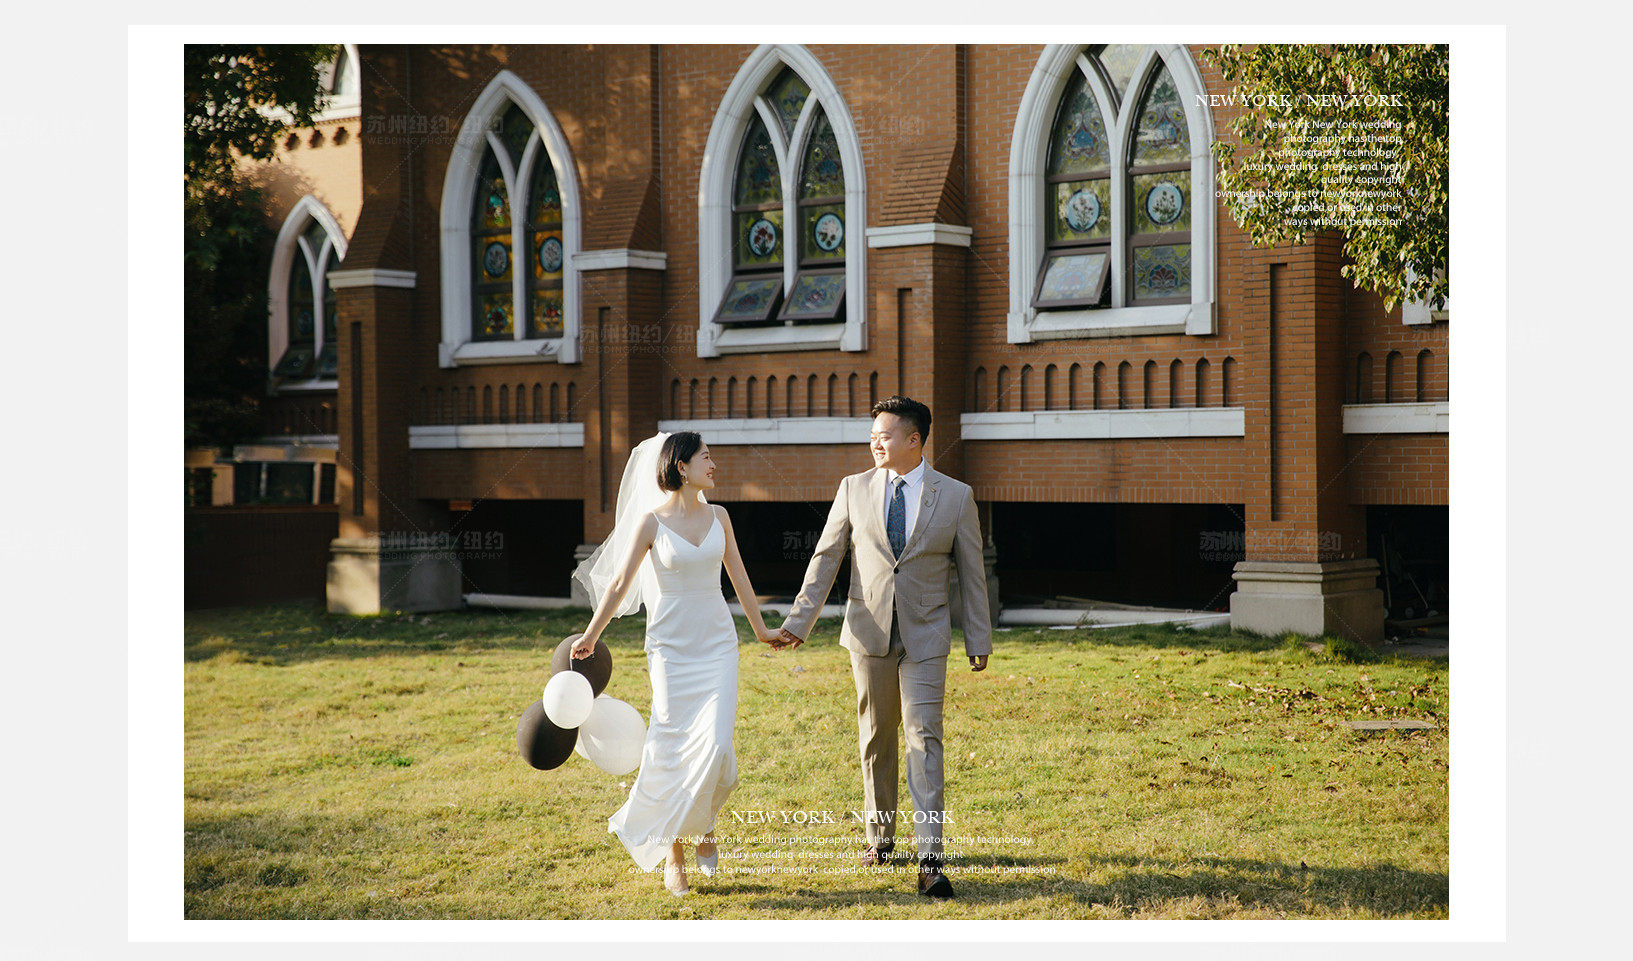 Mr.金 & Ms.向(纽约纽约最新客照)婚纱摄影照